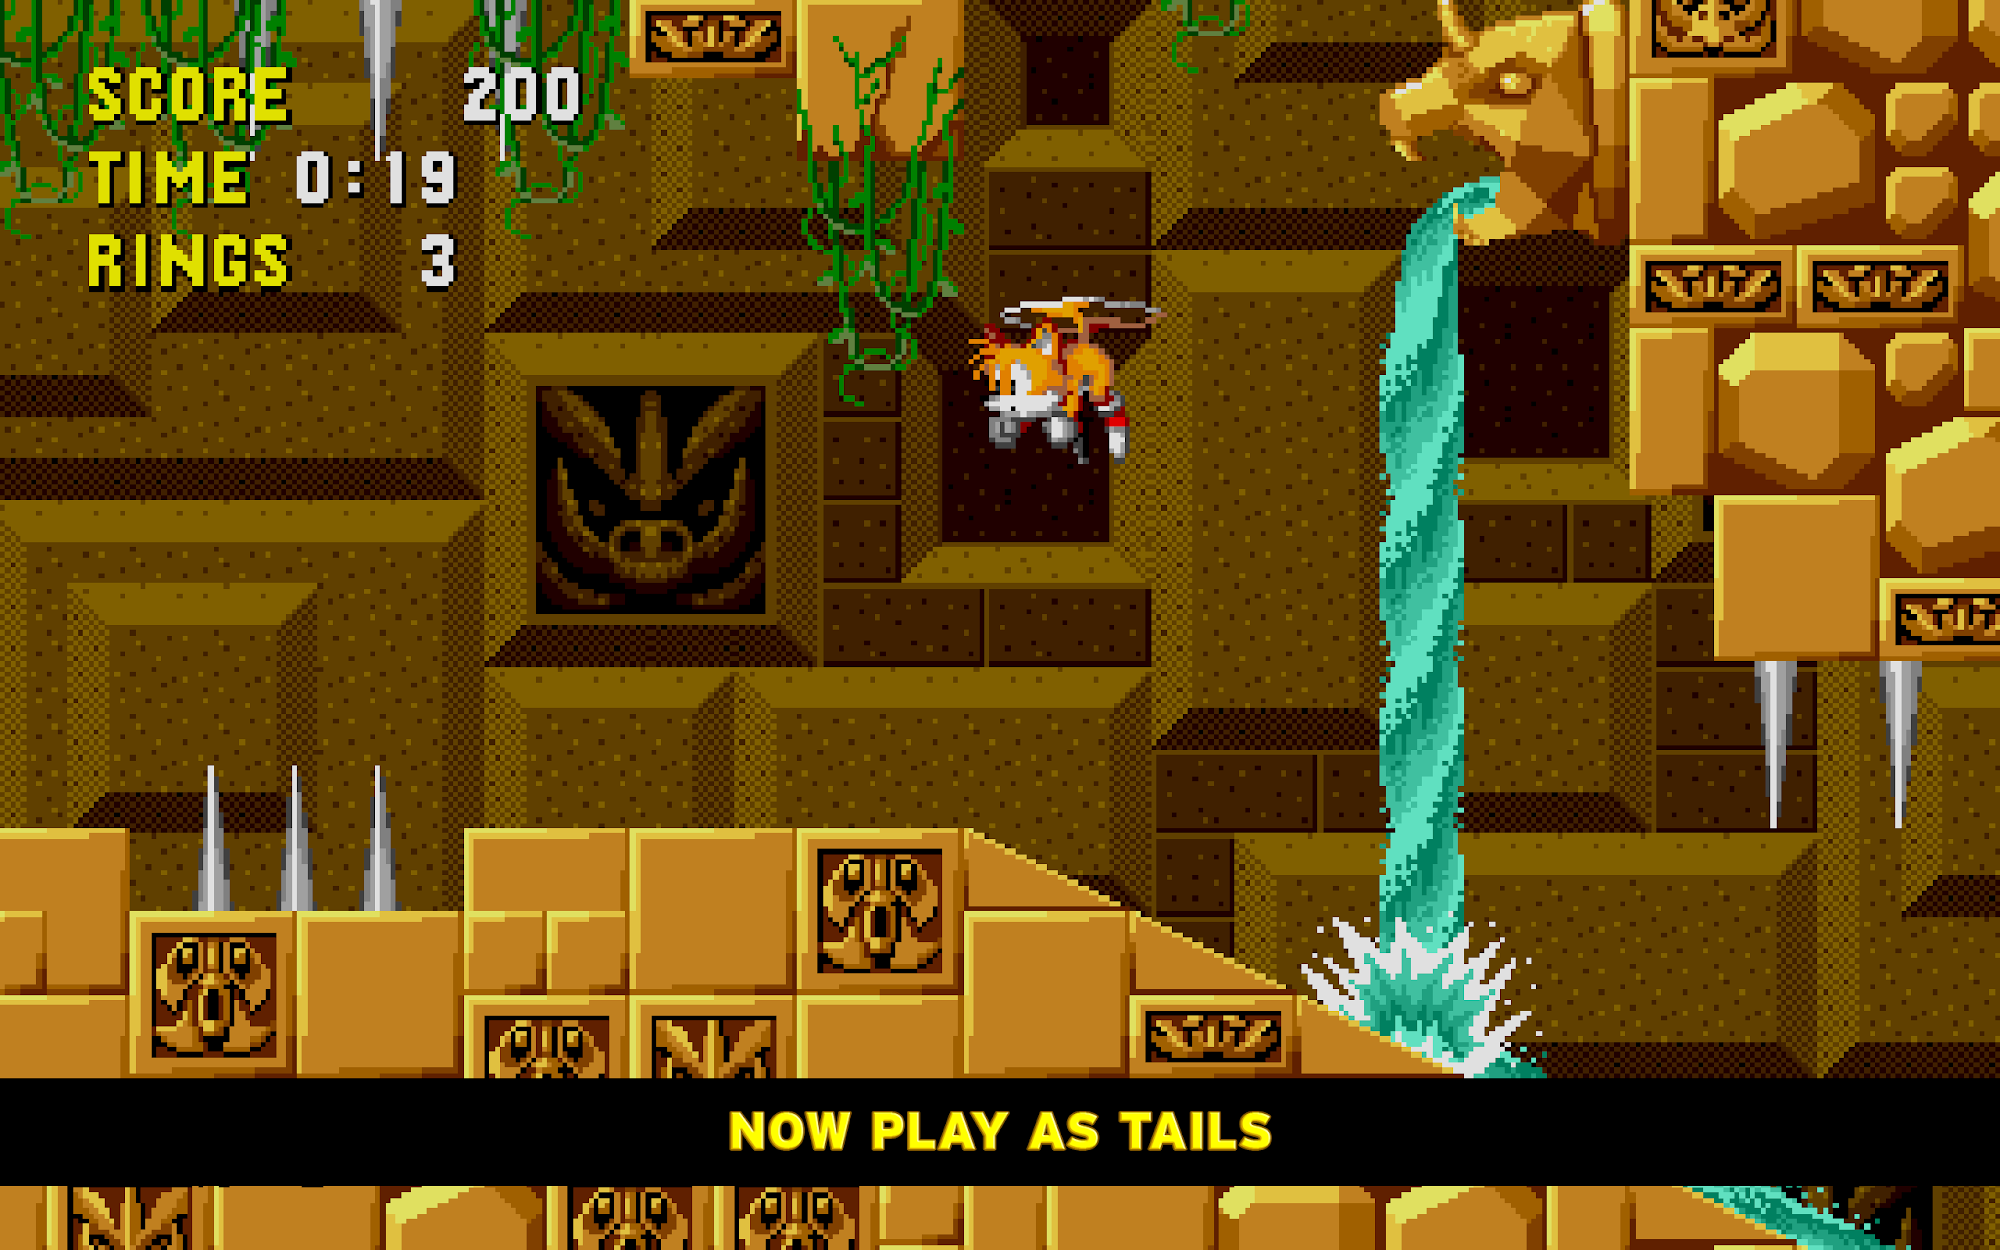 Sonic The Hedgehog screenshot #9